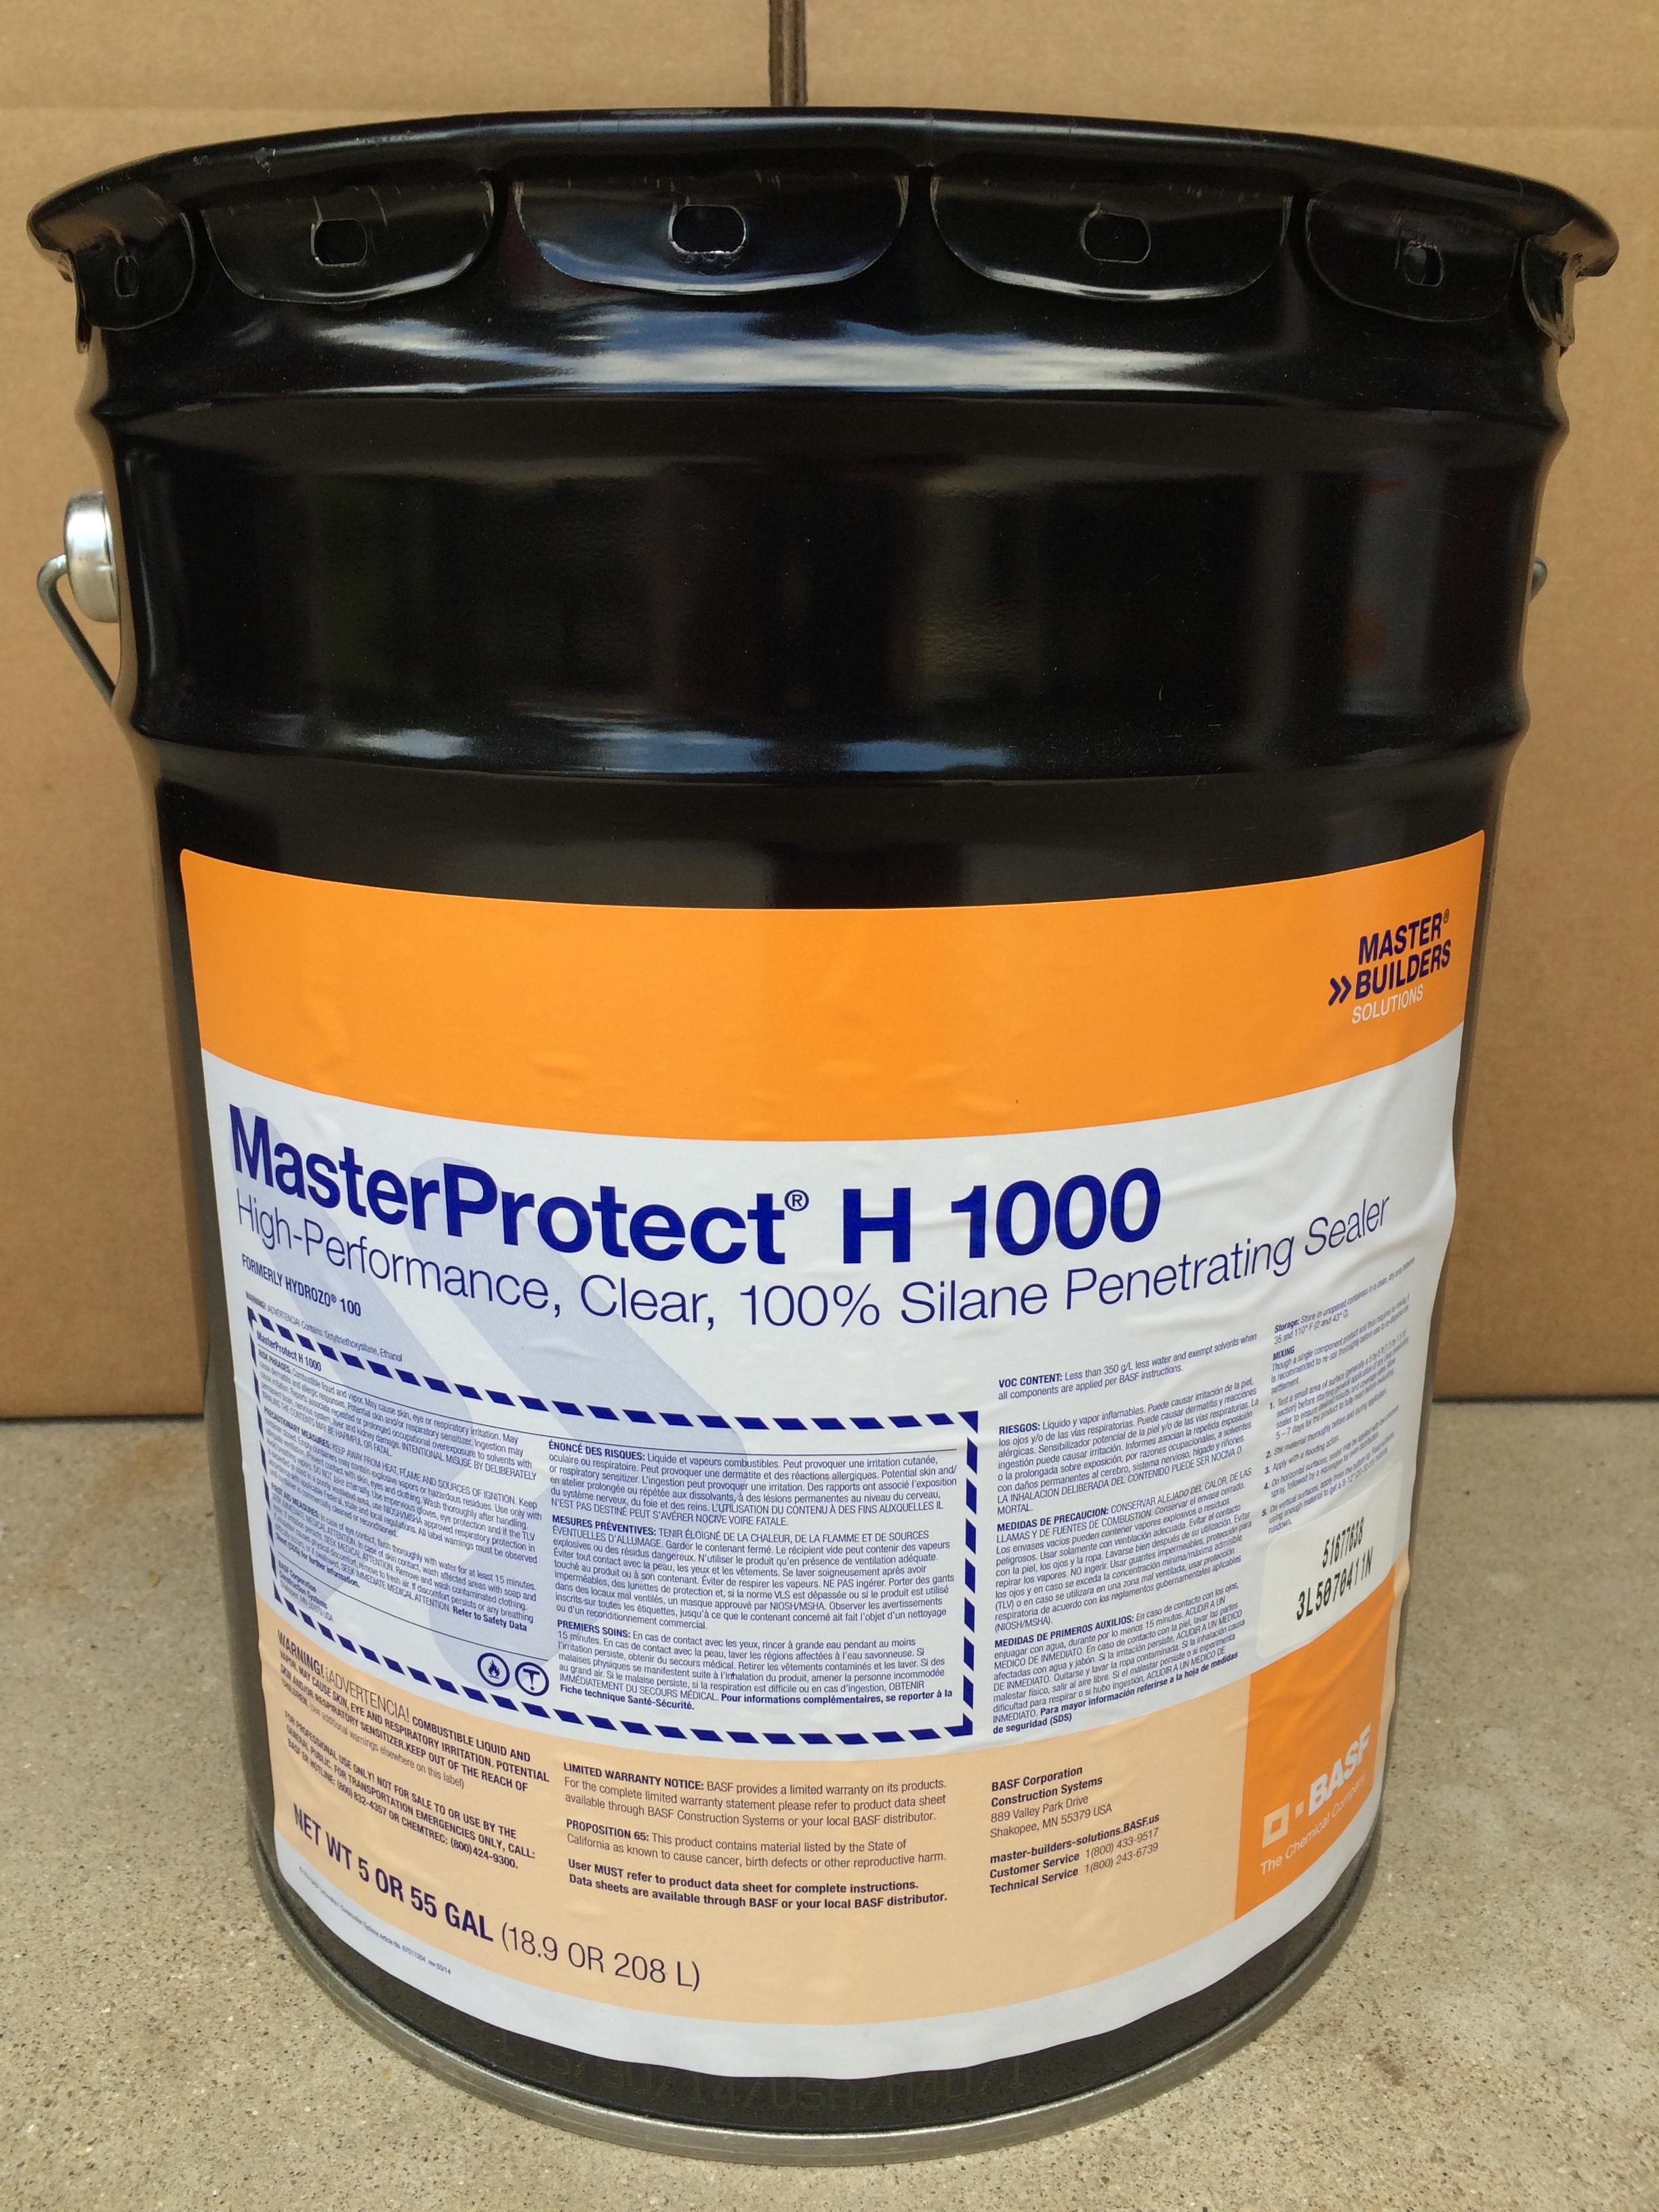 BASF MasterProtect H 1000 High Perfomance Silane Penetrating